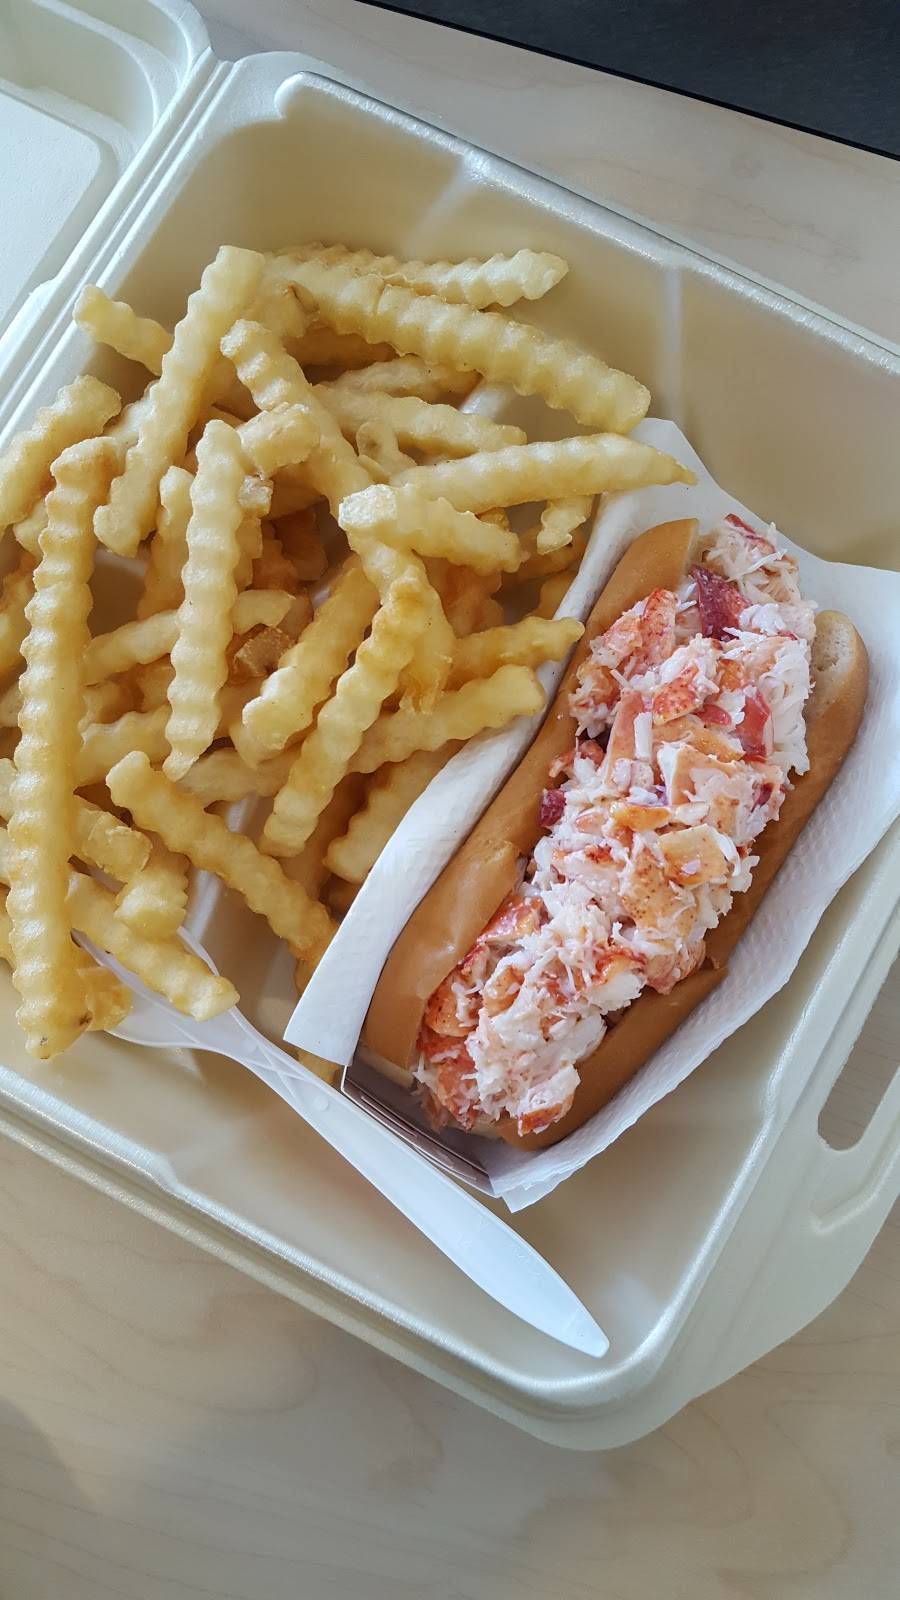 Jordans Snack Bar | meal takeaway | 200 Downeast Highway, Ellsworth, ME 04605, USA | 2076672174 OR +1 207-667-2174